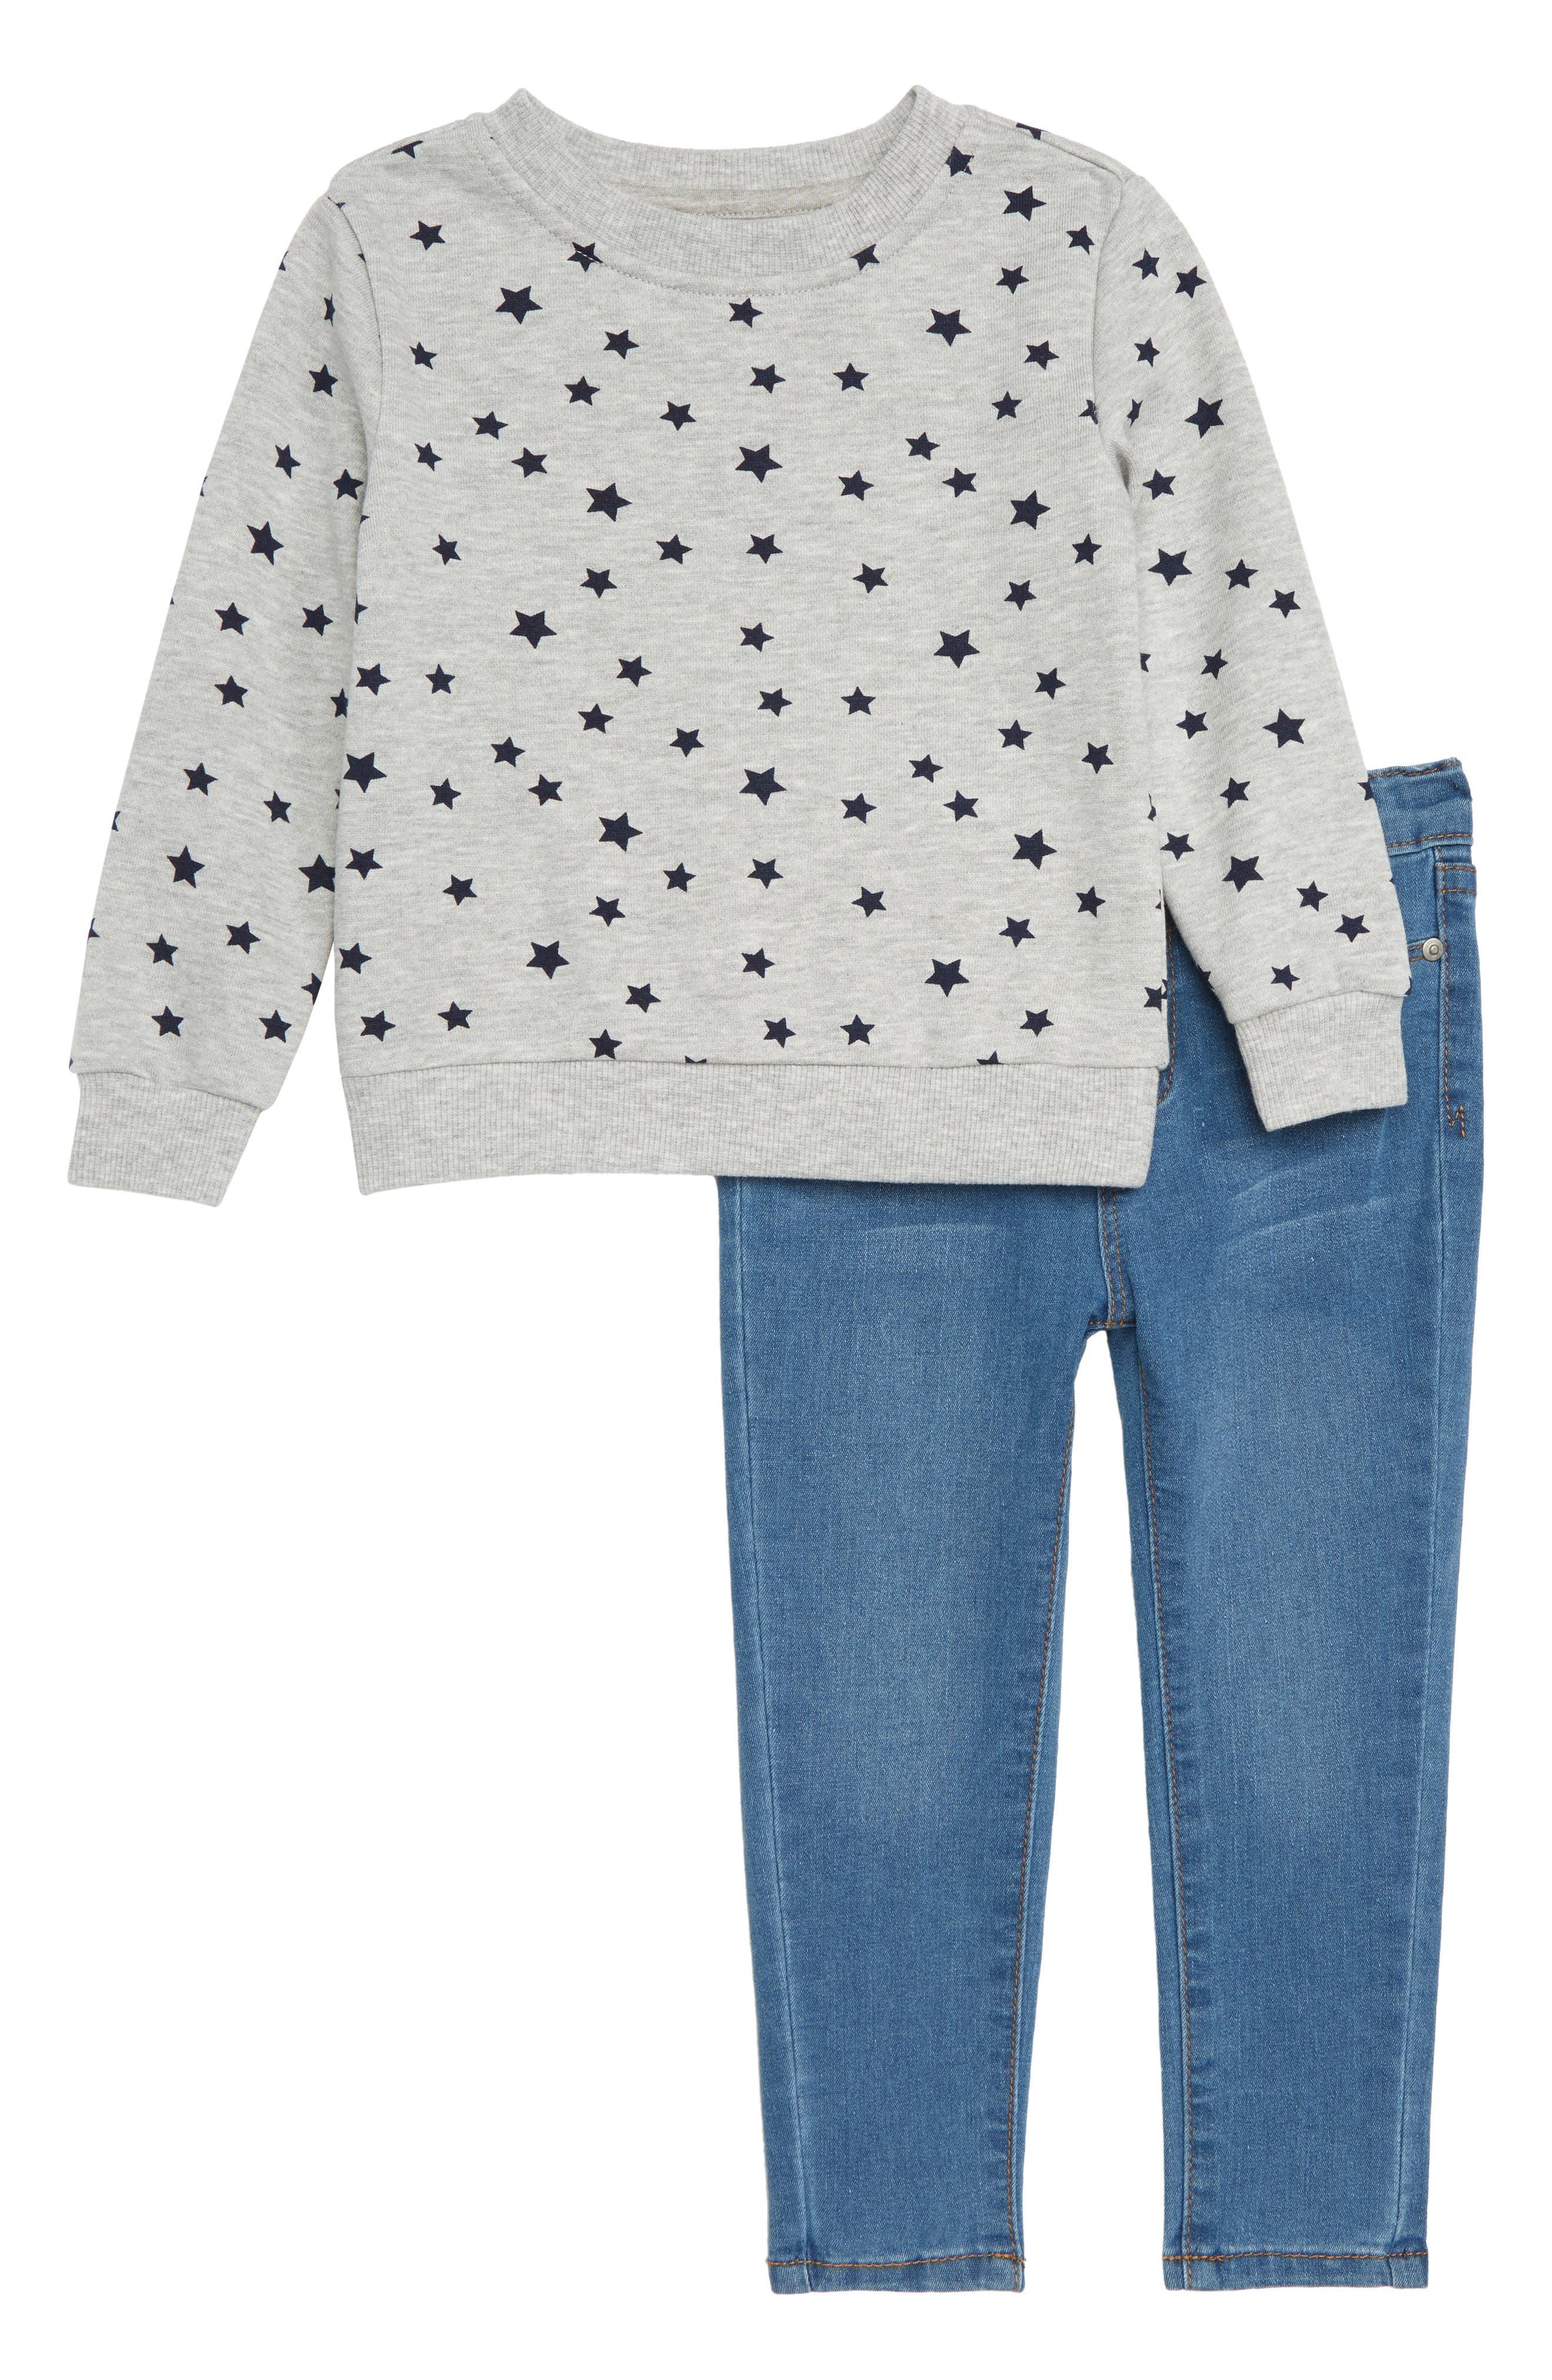 Sweatshirt & Jeans Set,                             Main thumbnail 1, color,                             950